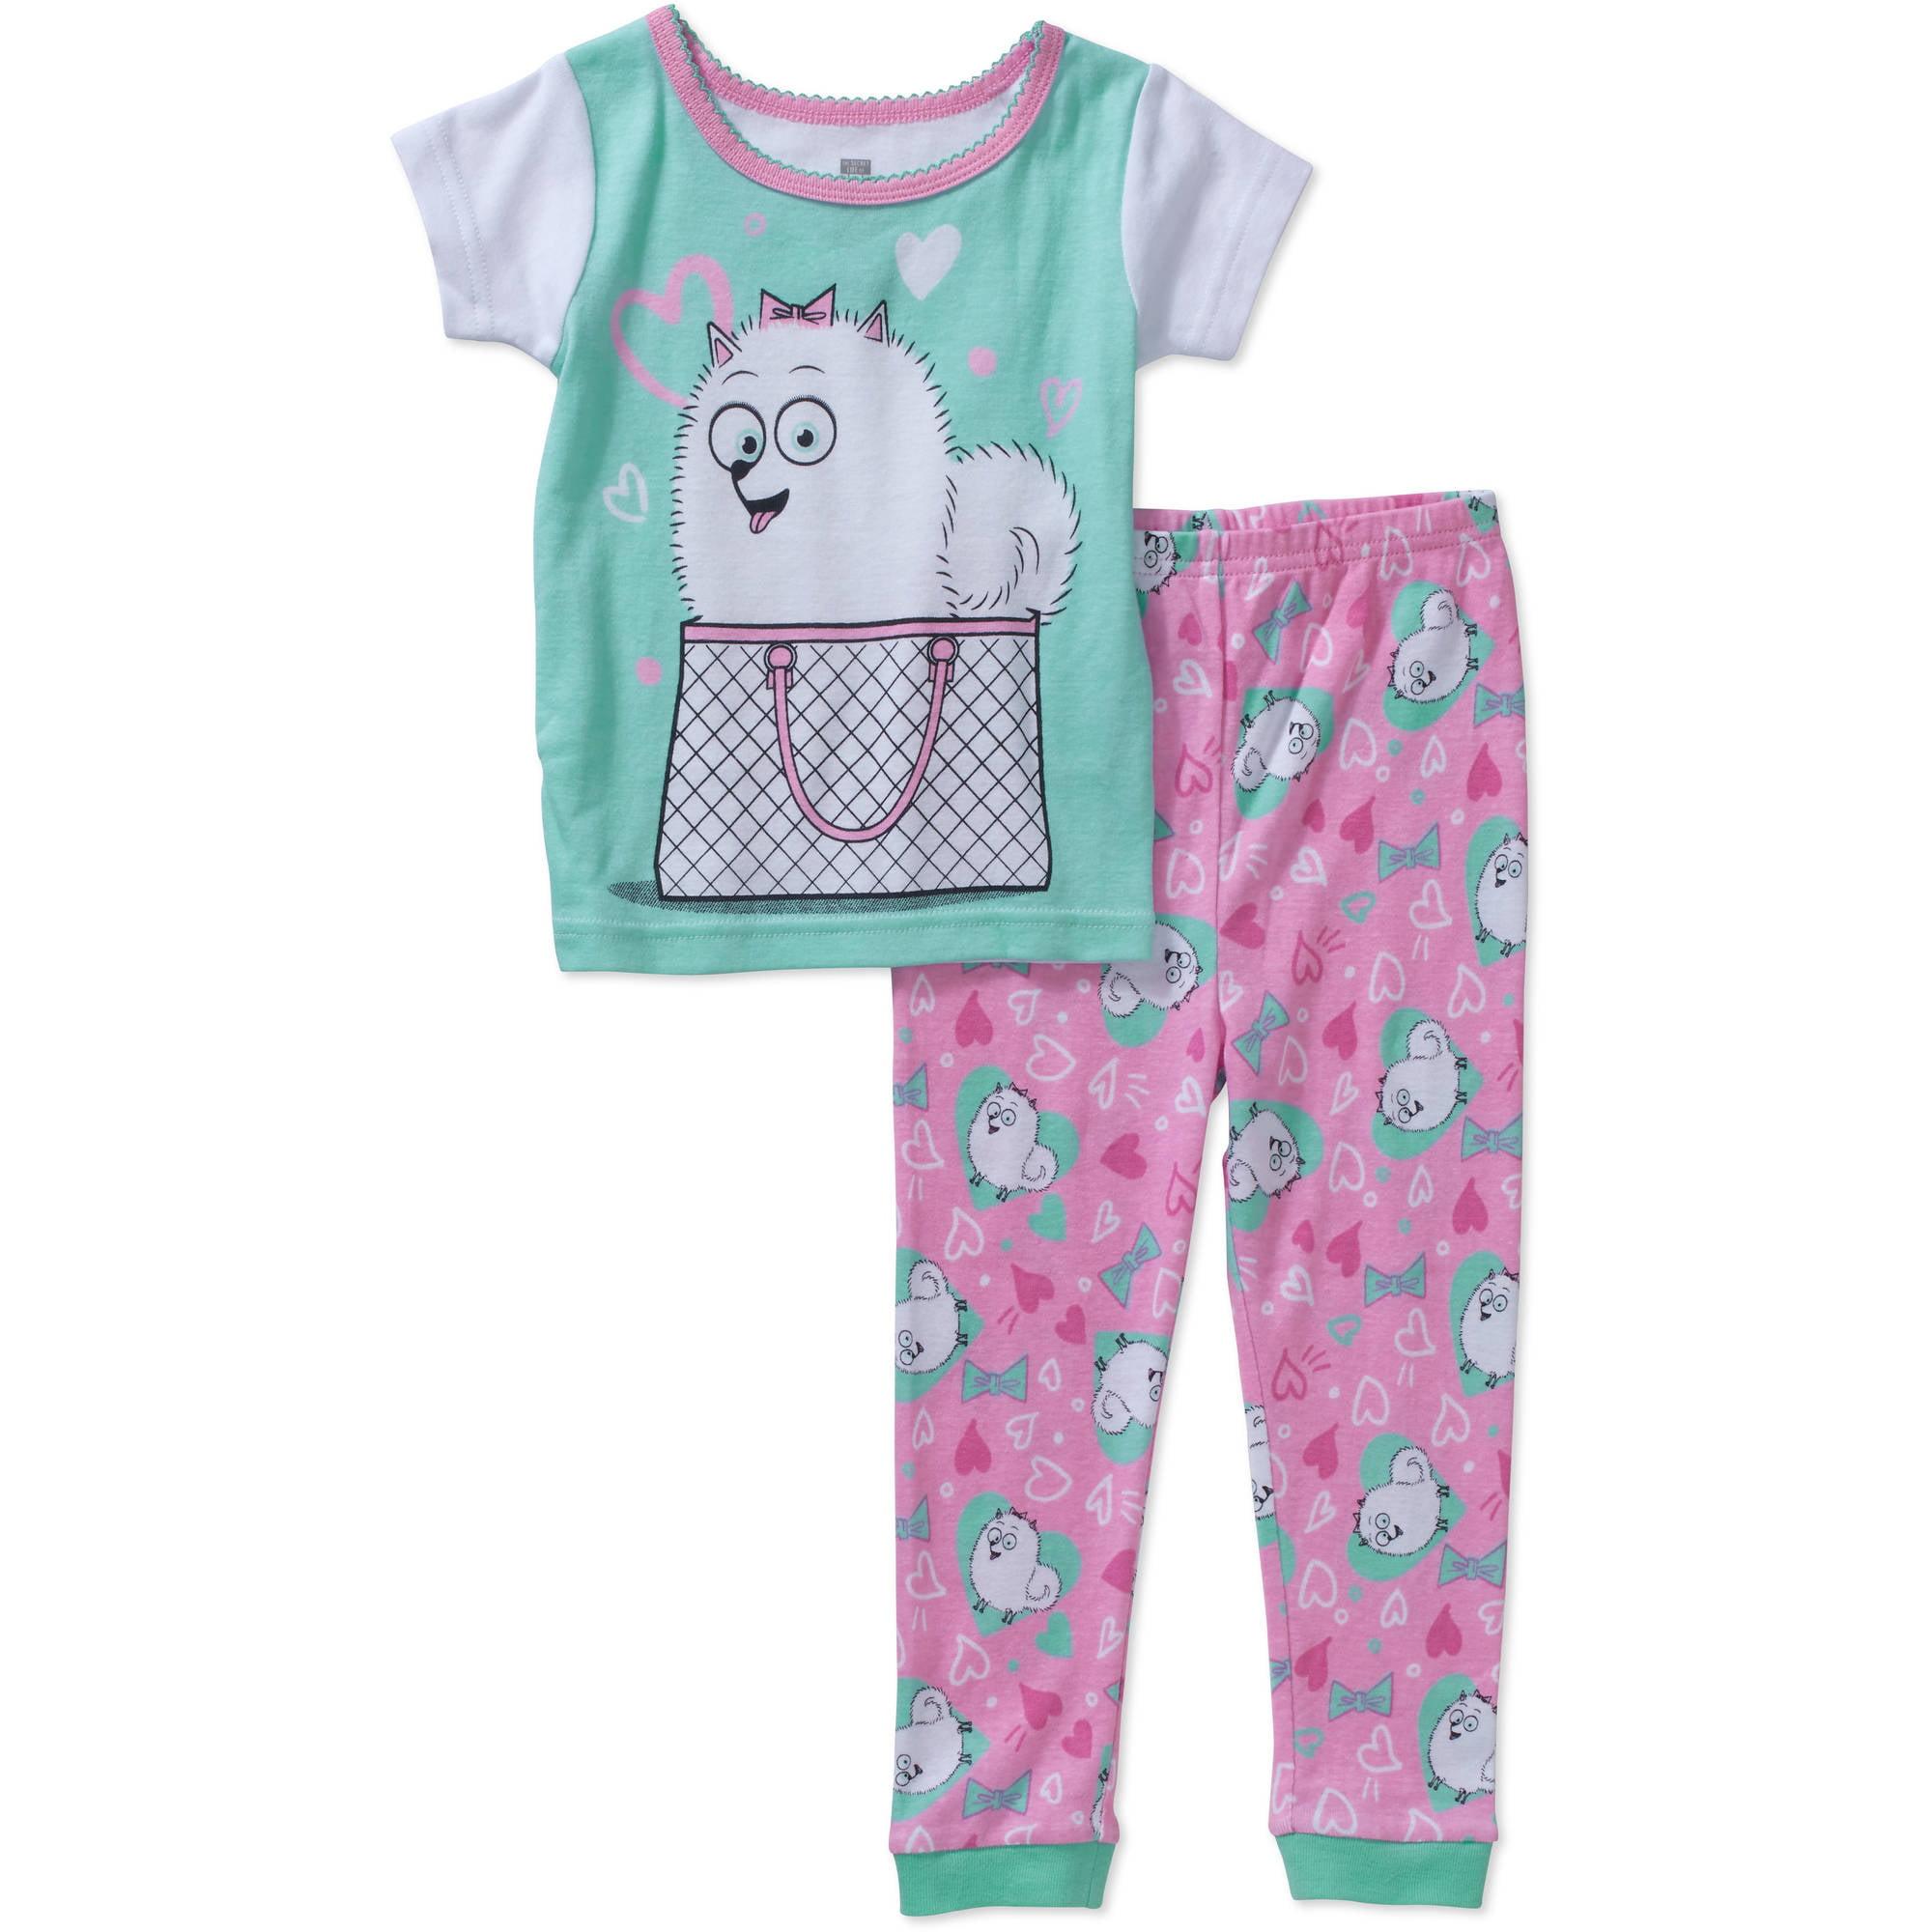 The Secret Life Of Pets Toddler Girls' Licensed Cotton Pajama Sleepwear Set